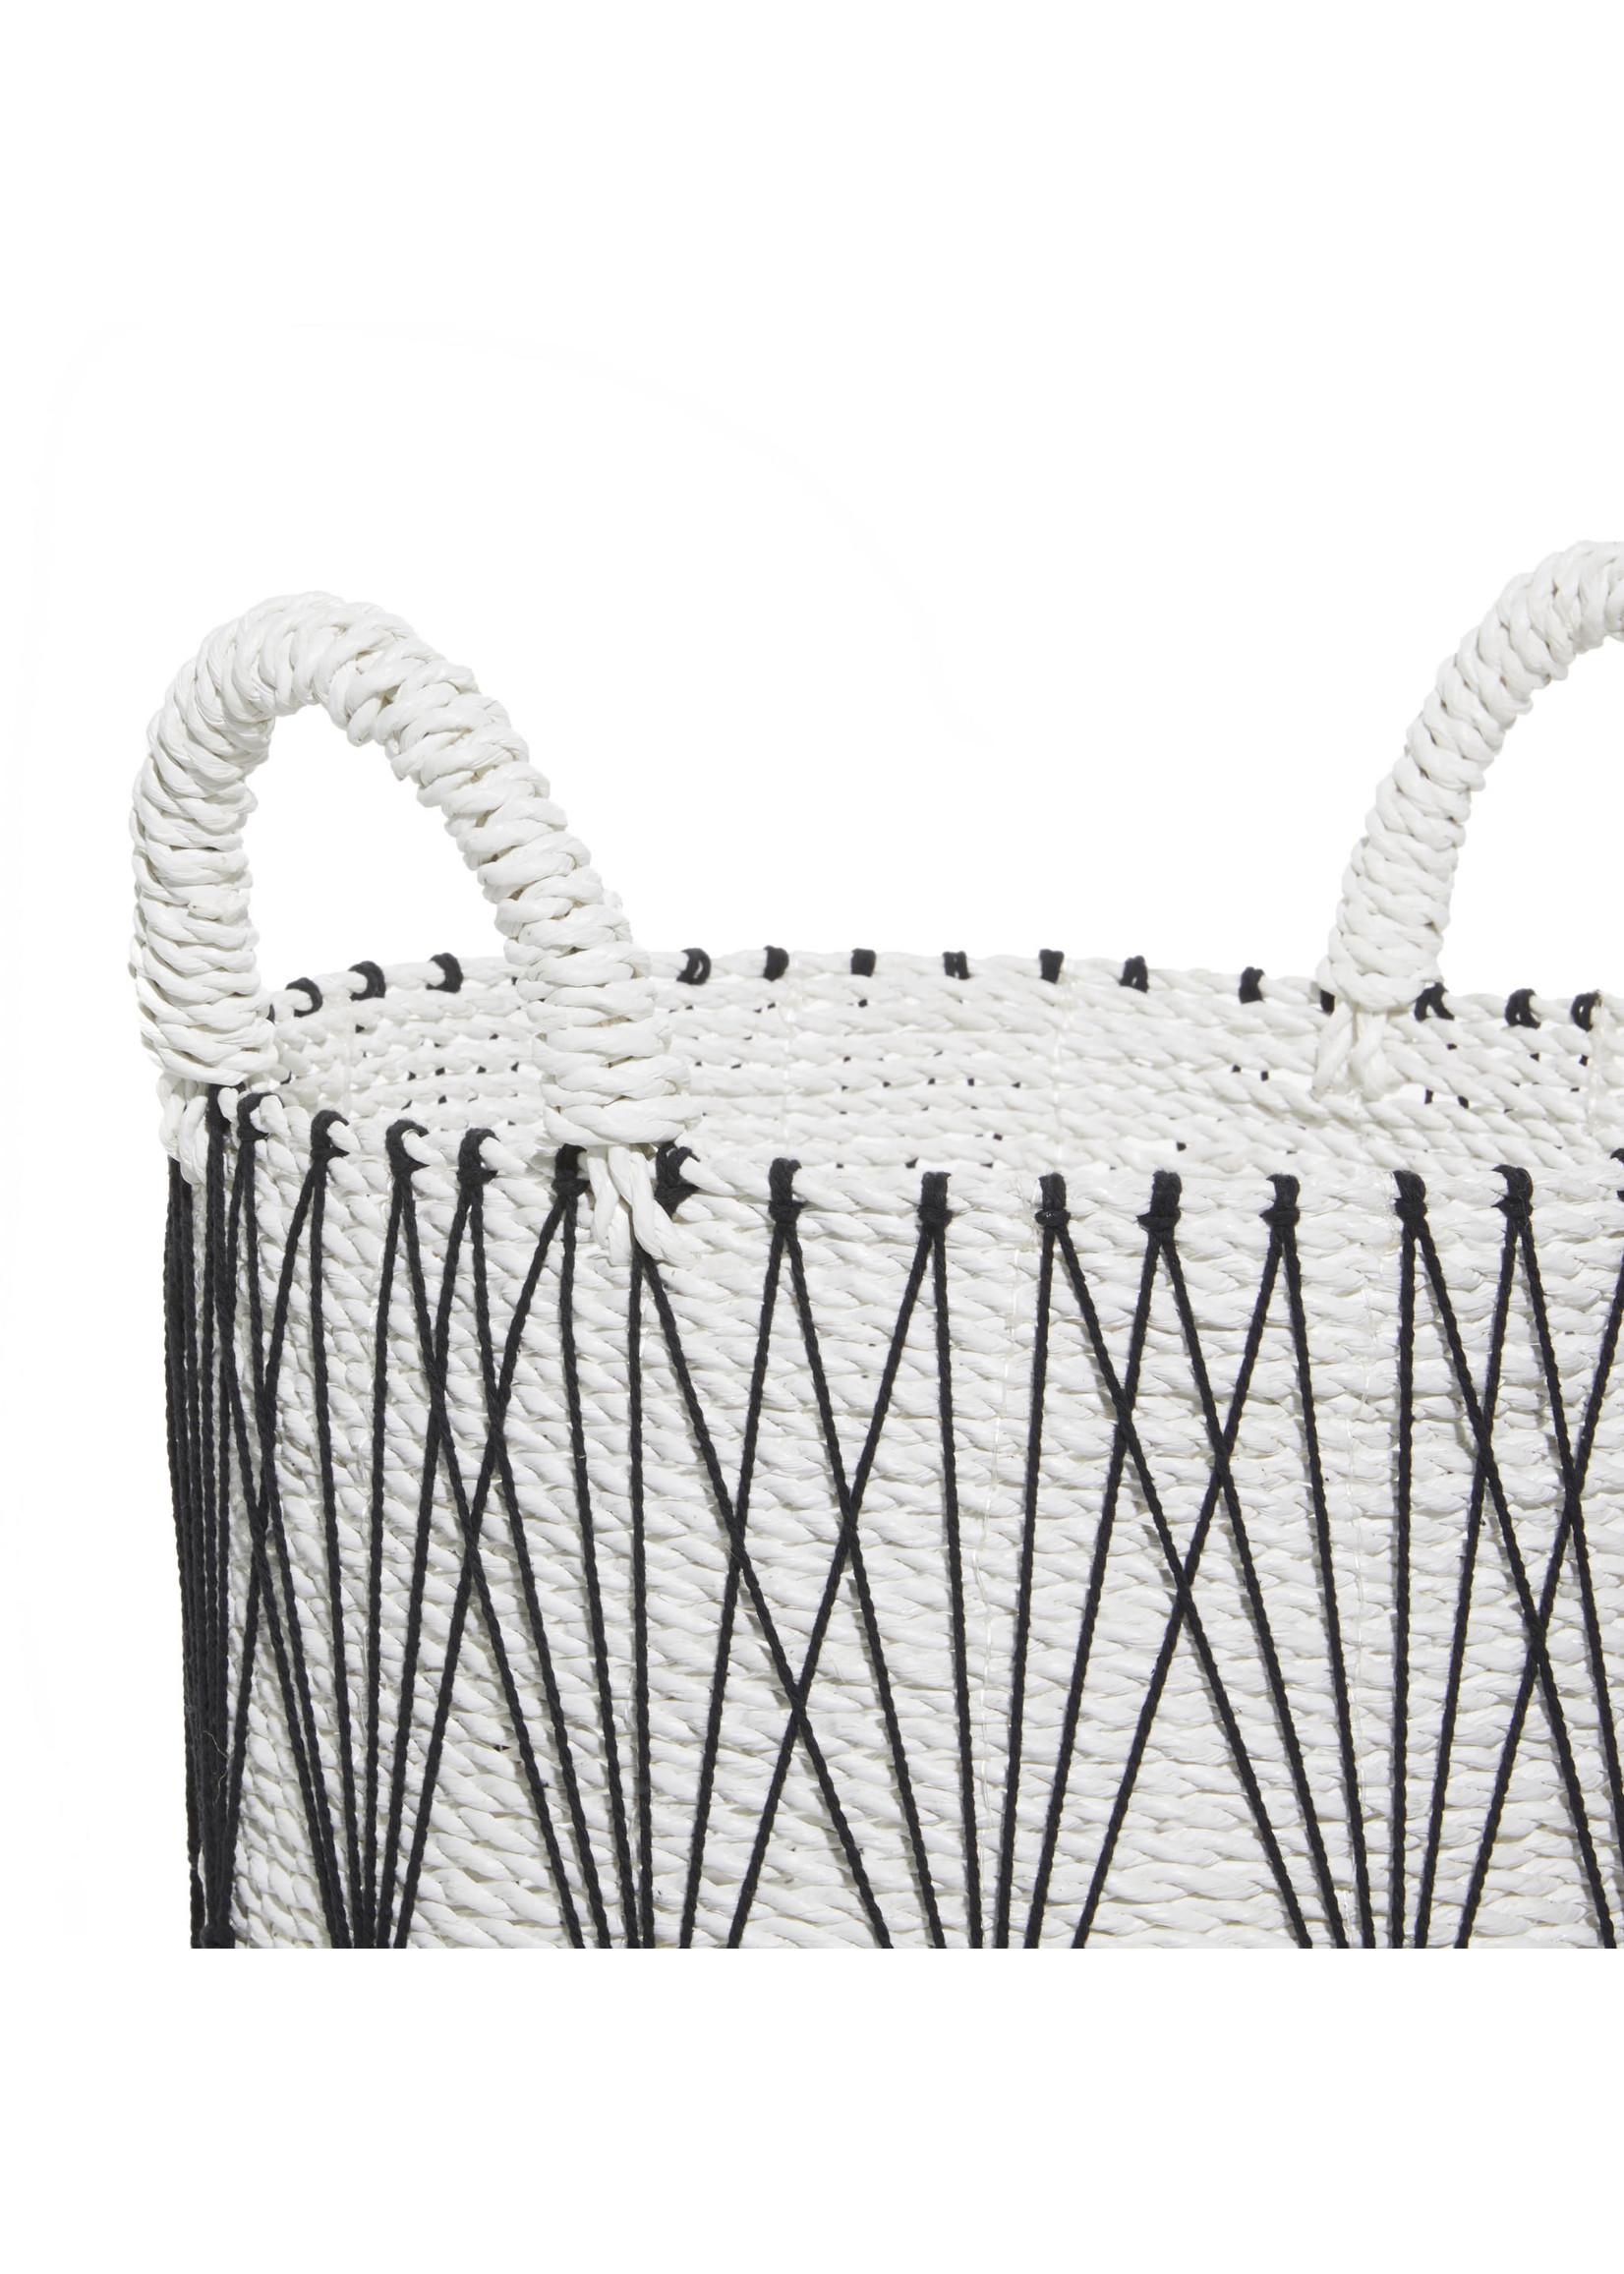 UMA Enterprises Black & White Cotton Basket - Small